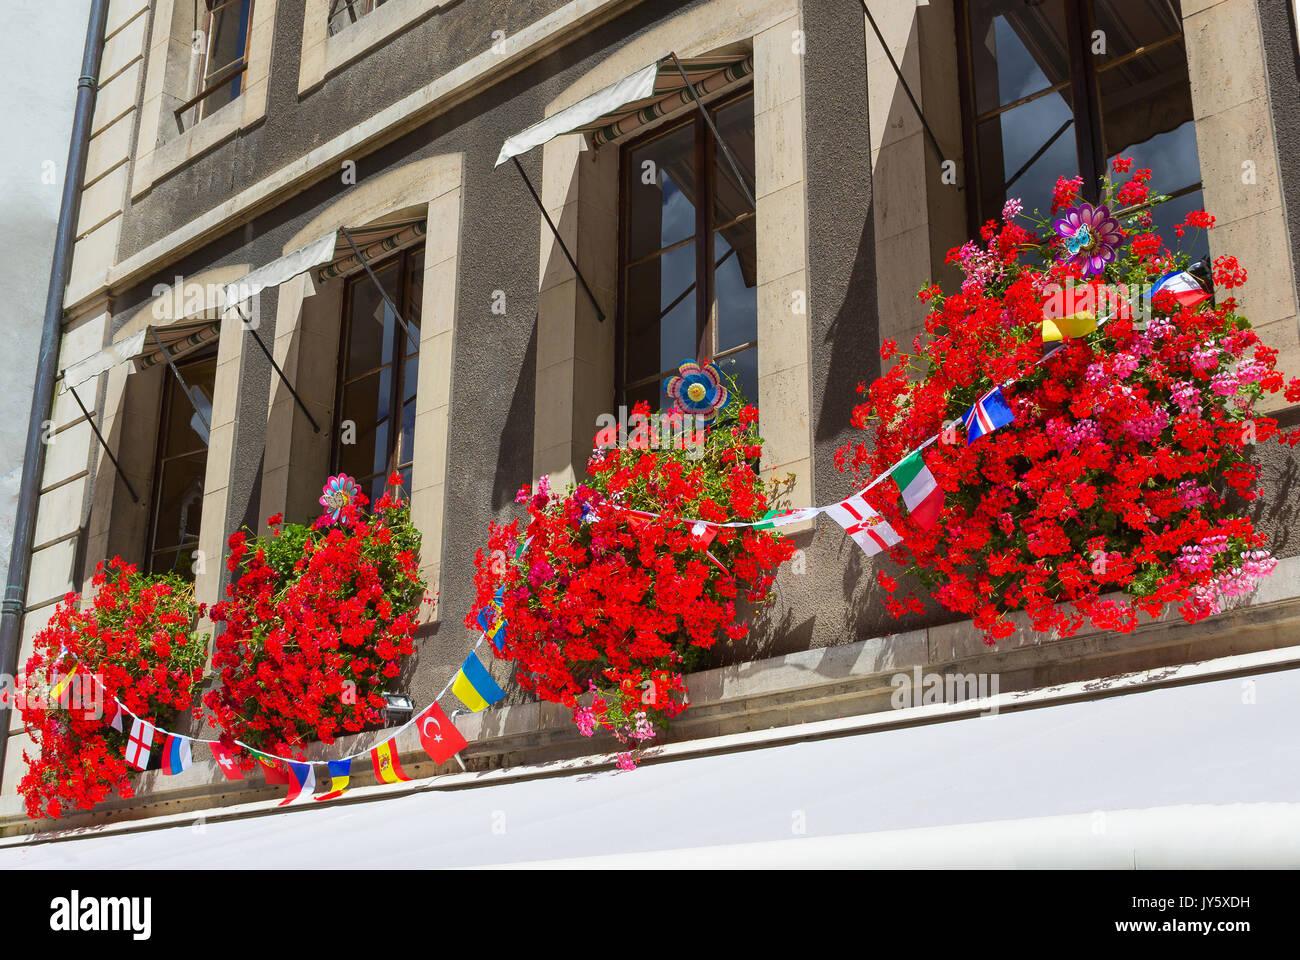 Vintage window with flowers and flags, Geneva, Switzerland - Stock Image